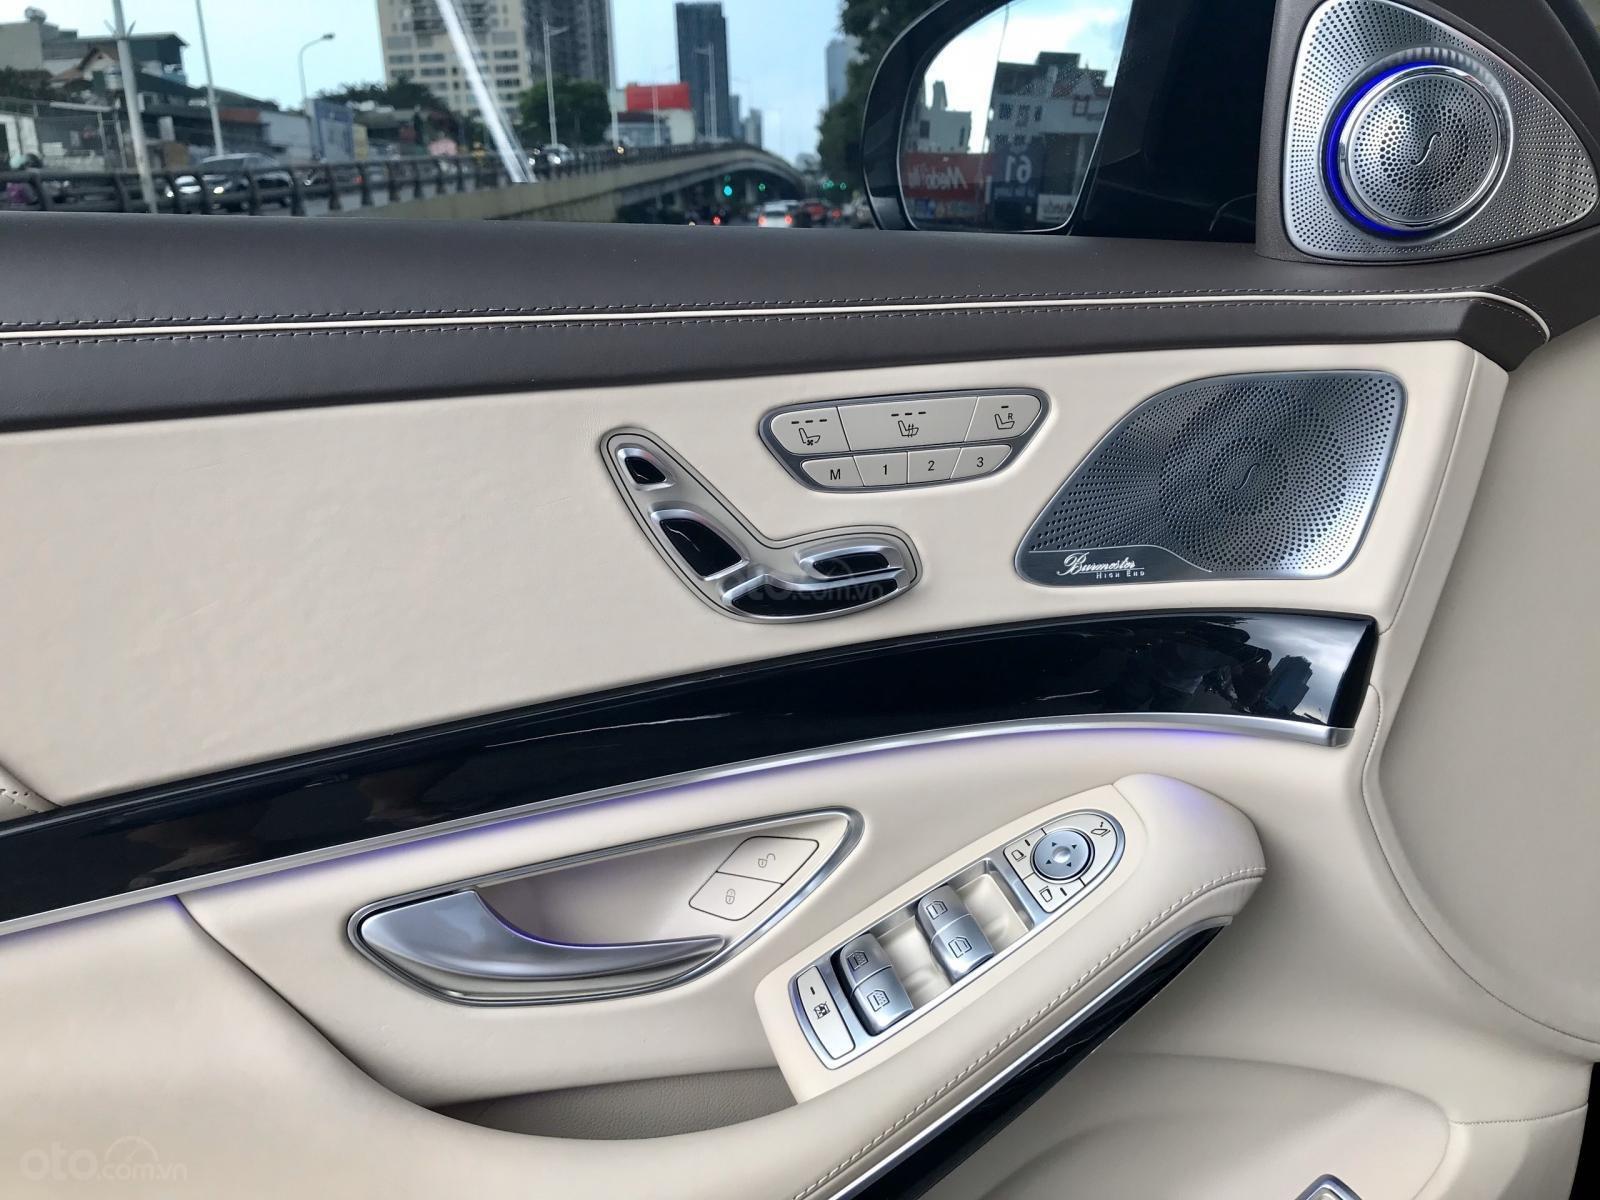 Mercedes Benz S450 Luxury sản xuất 2019 (14)